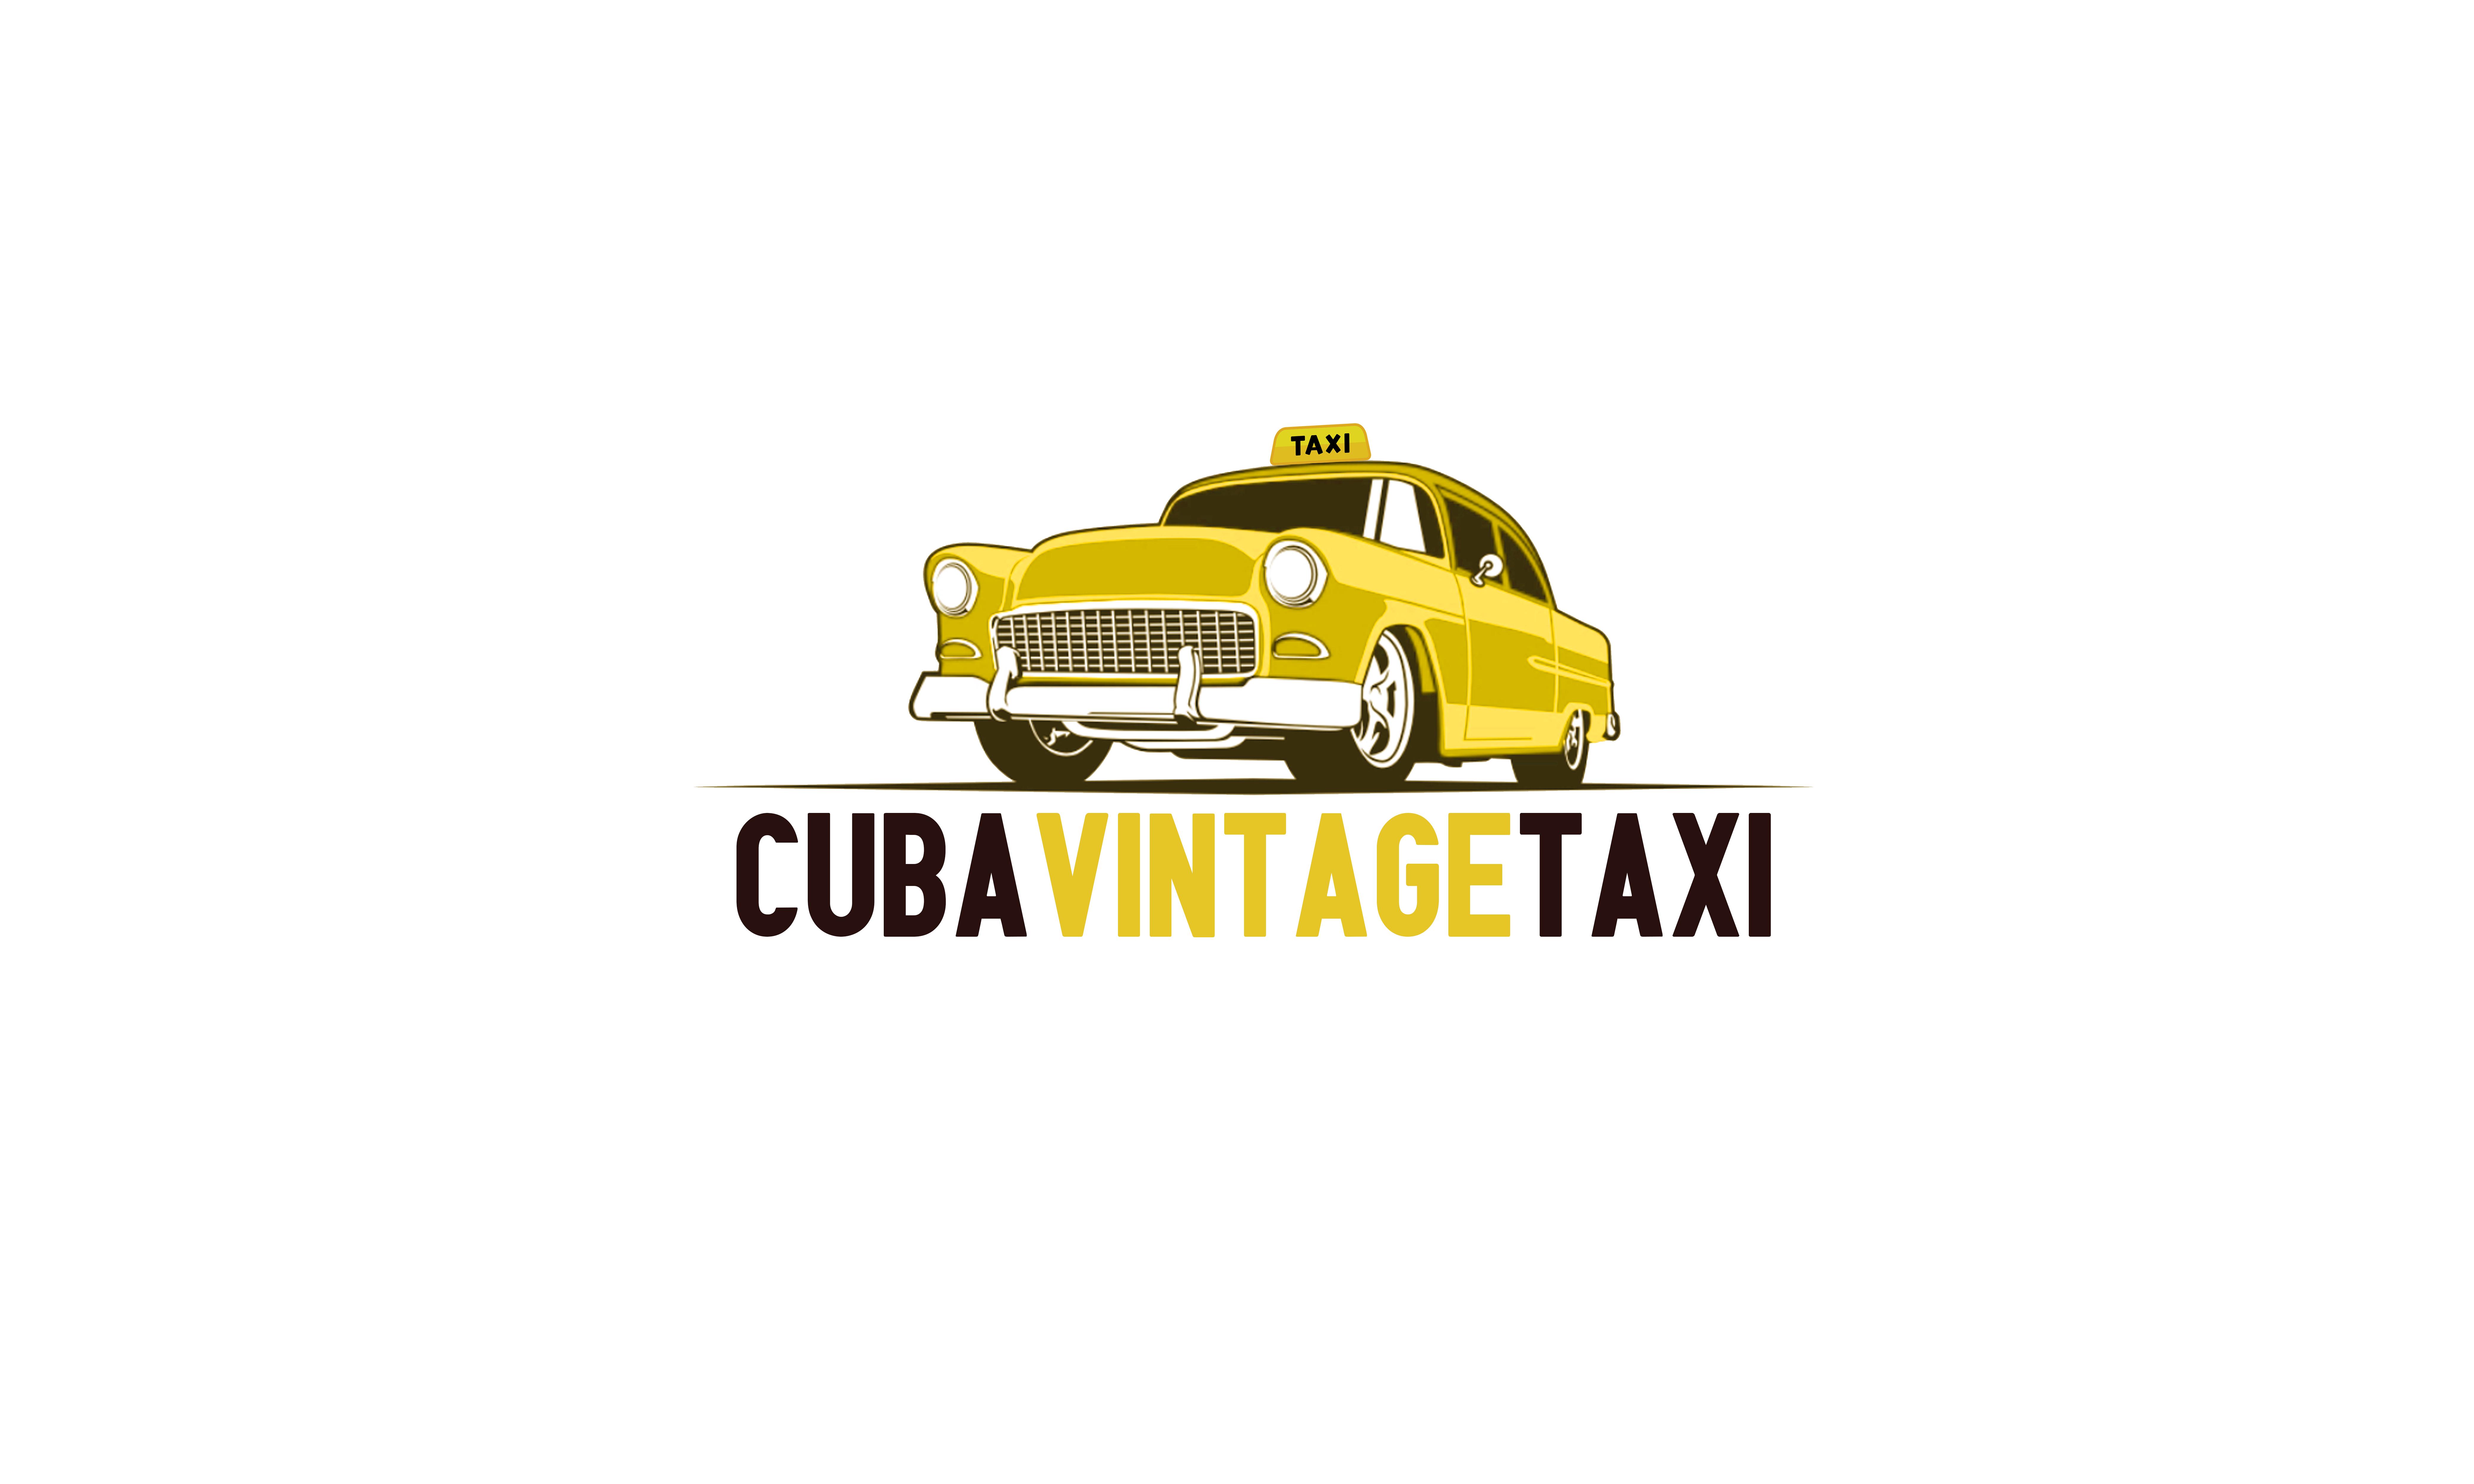 cubavintagetaxi.com